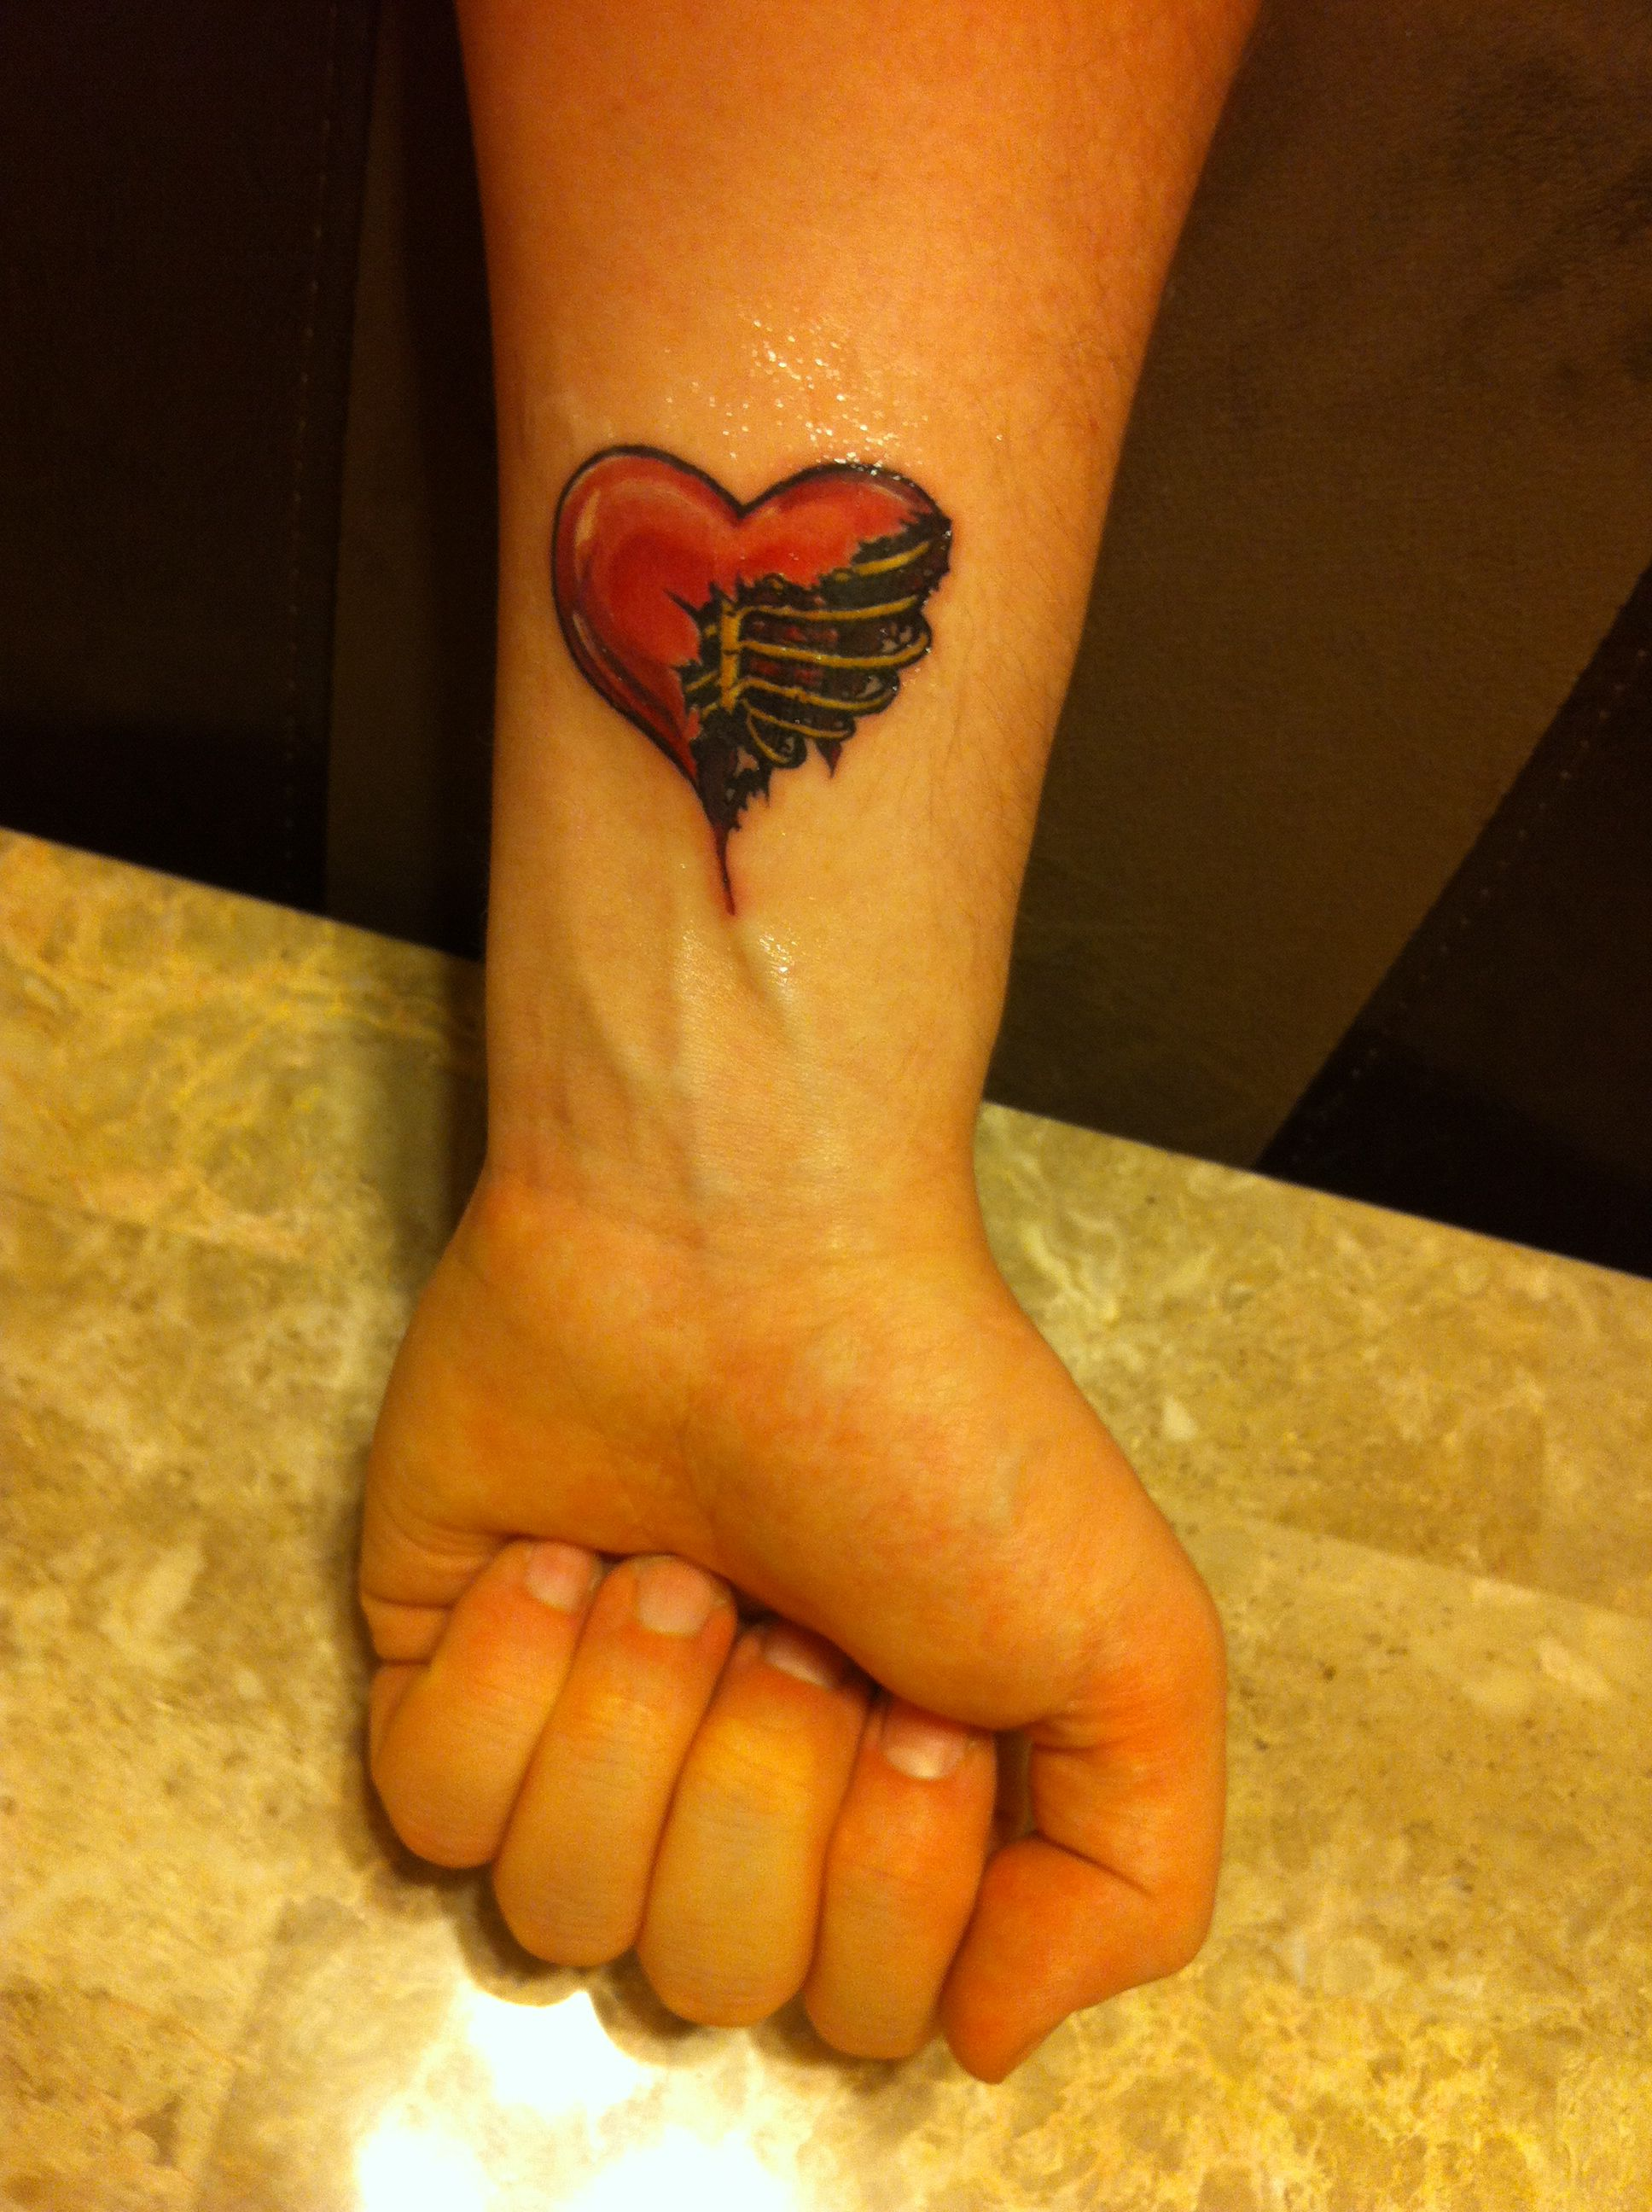 I wear my heart on my sleeve my 1st tattoo Love tattoos